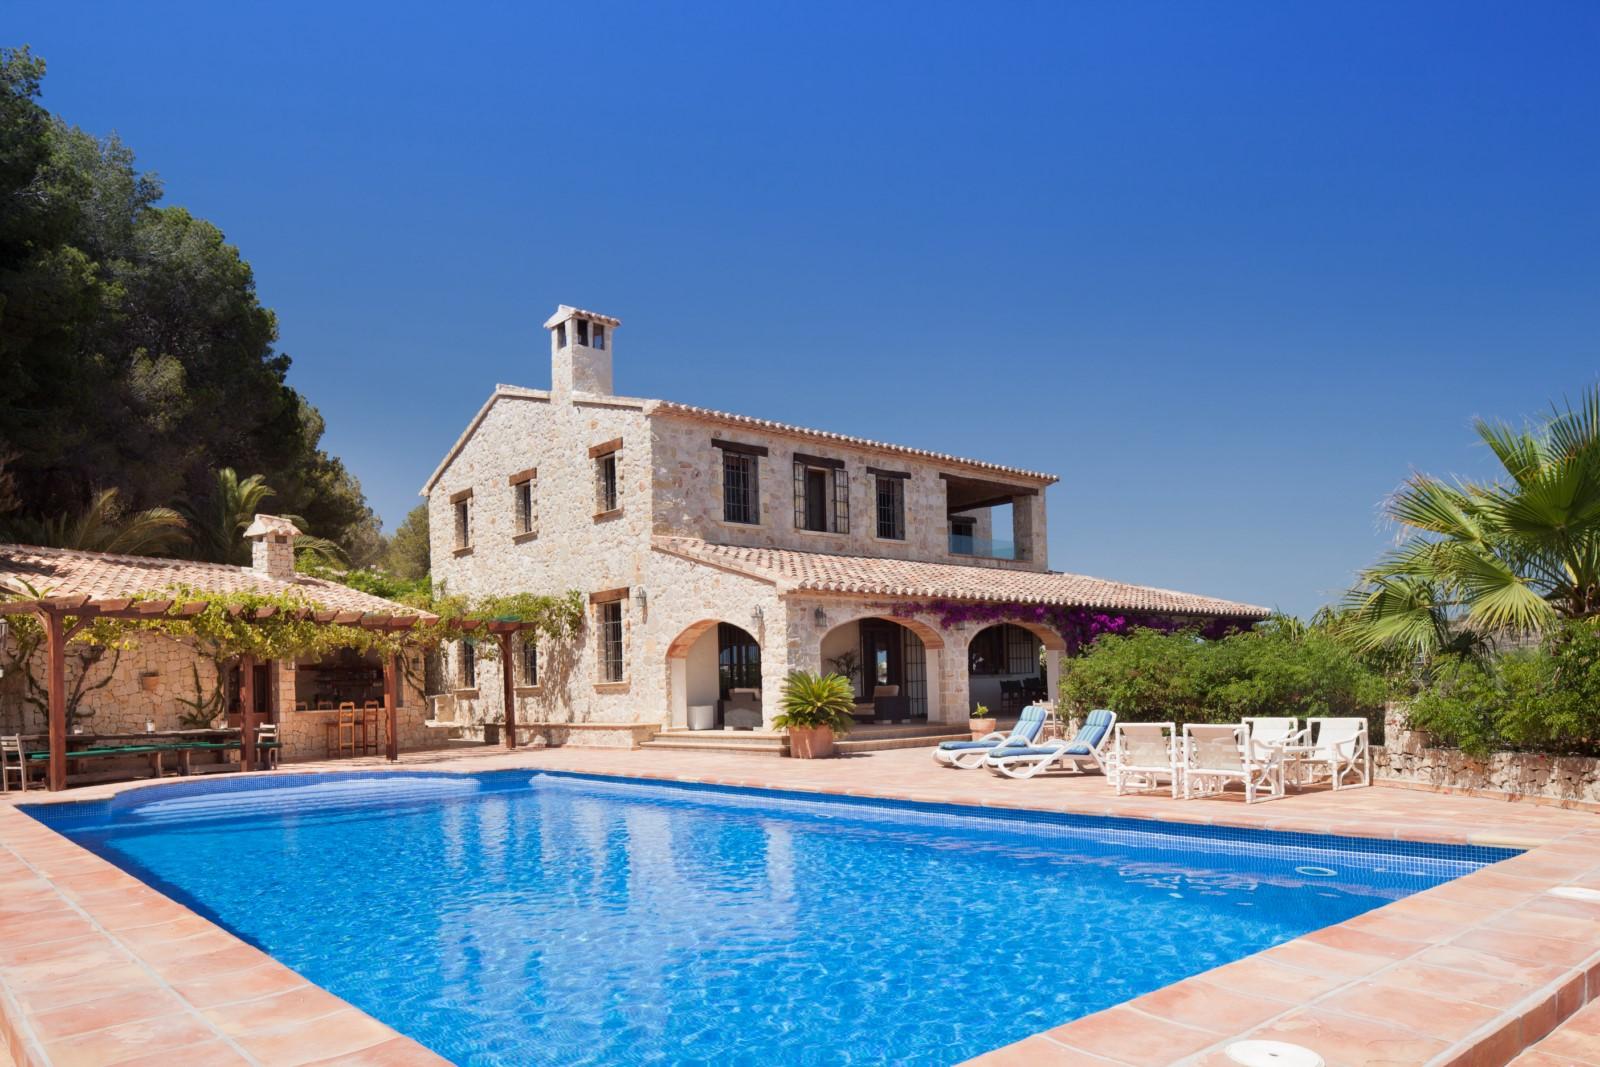 5 Bedroom Finca / Country House in Benissa